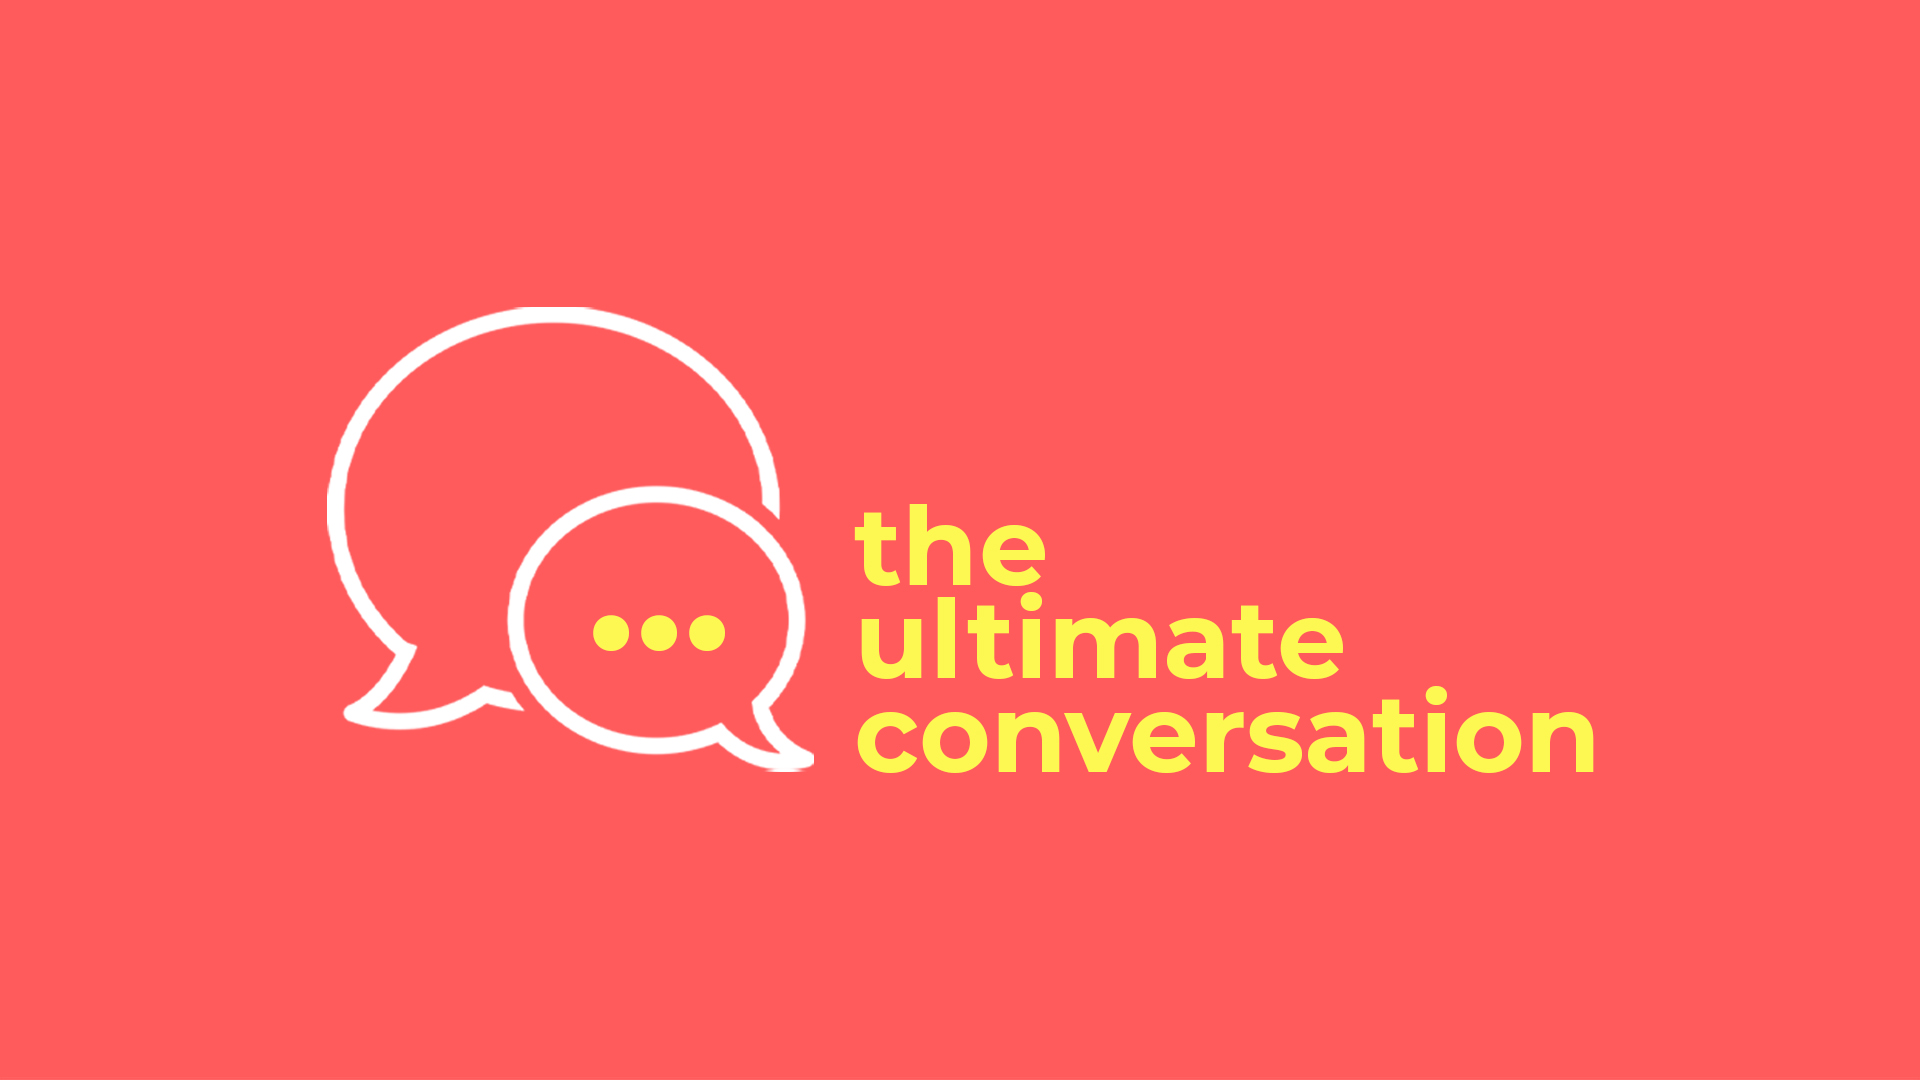 TheUltimateConversation 16x9.jpg